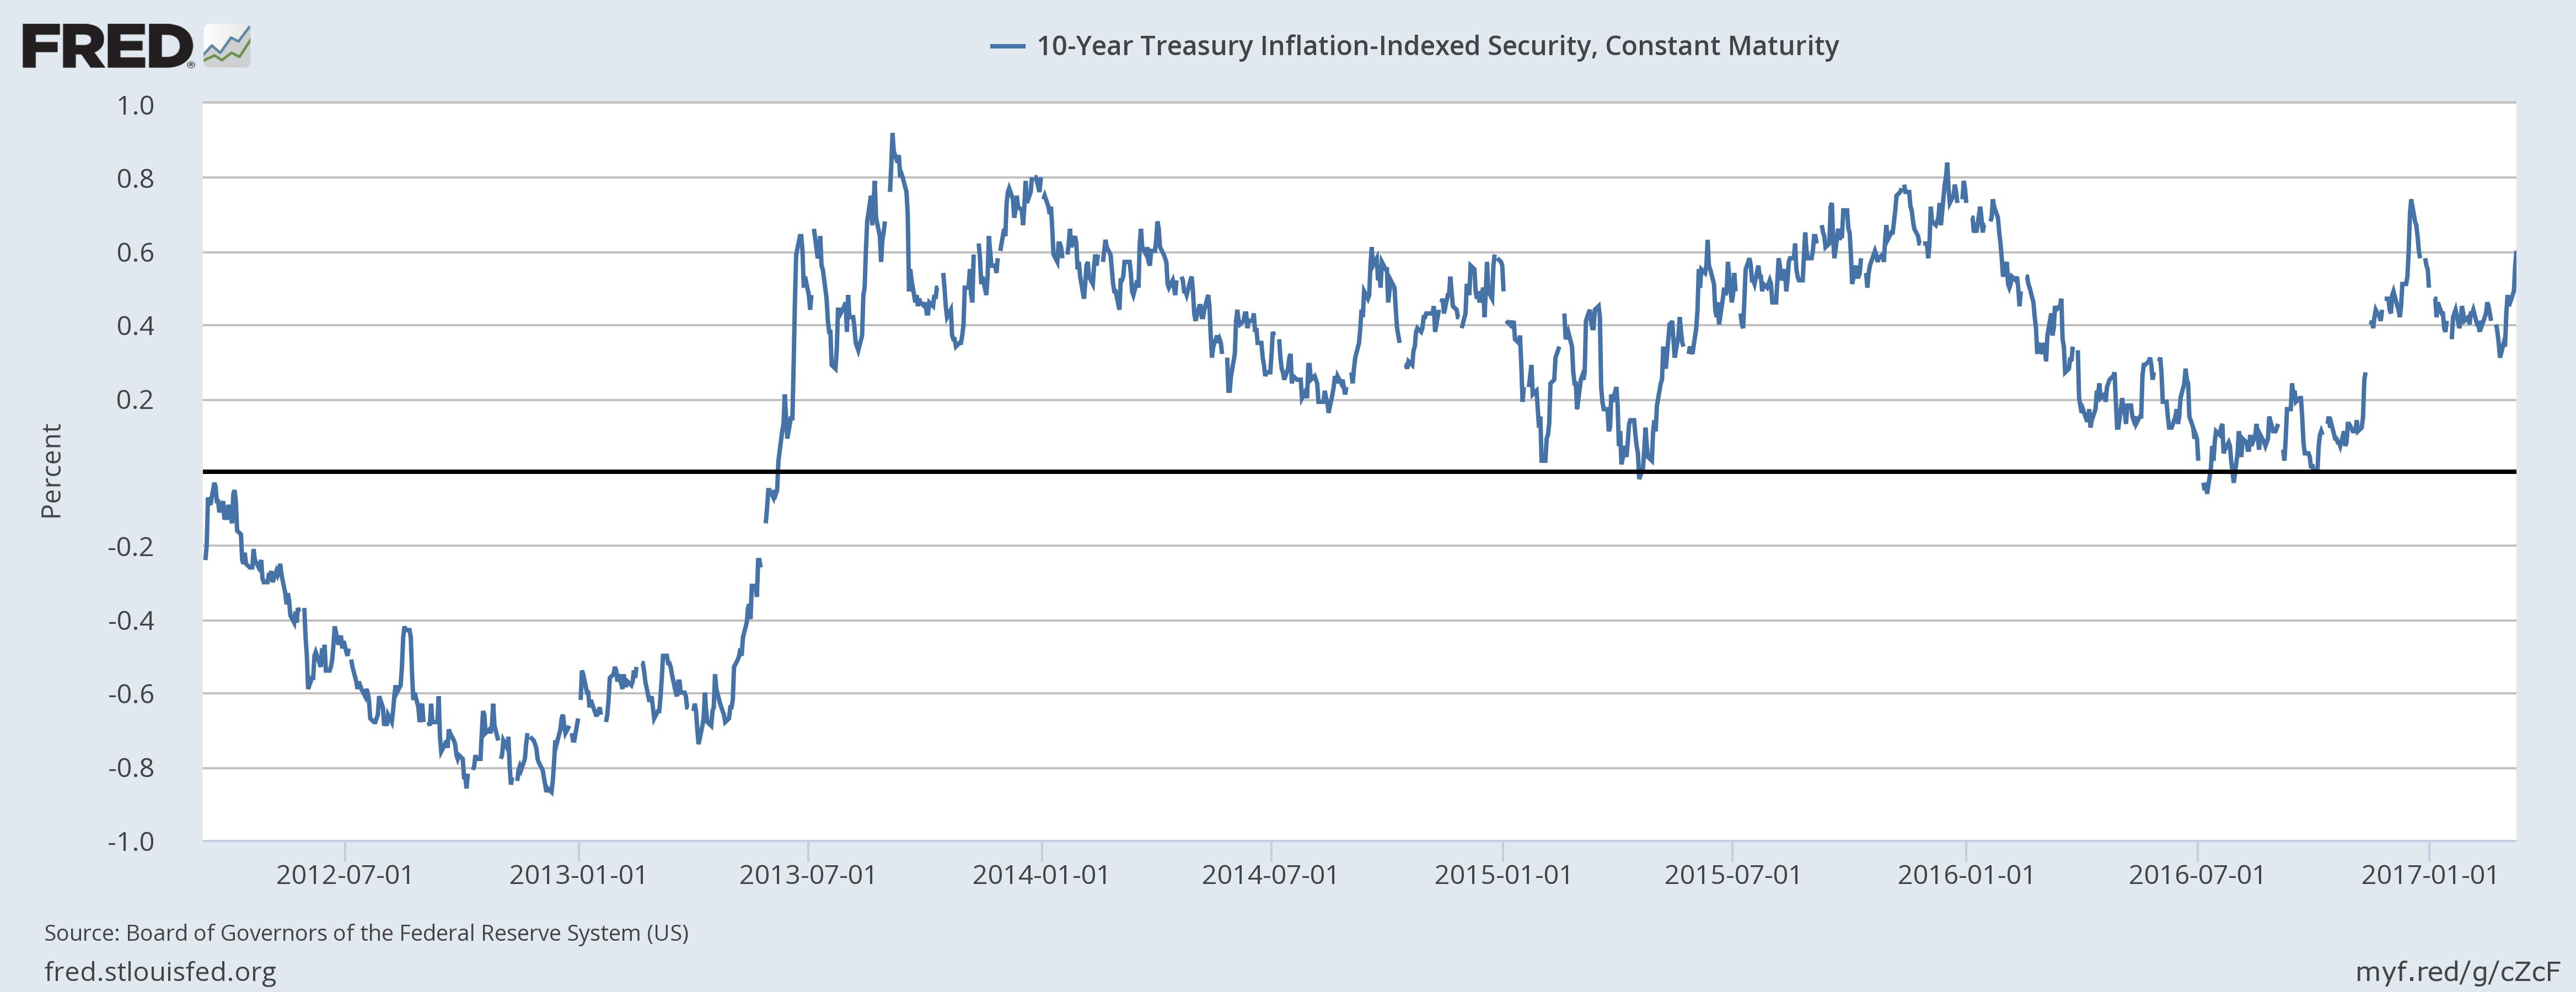 10 Year Treasury Inflation, Jul 2012 - Jan 2017